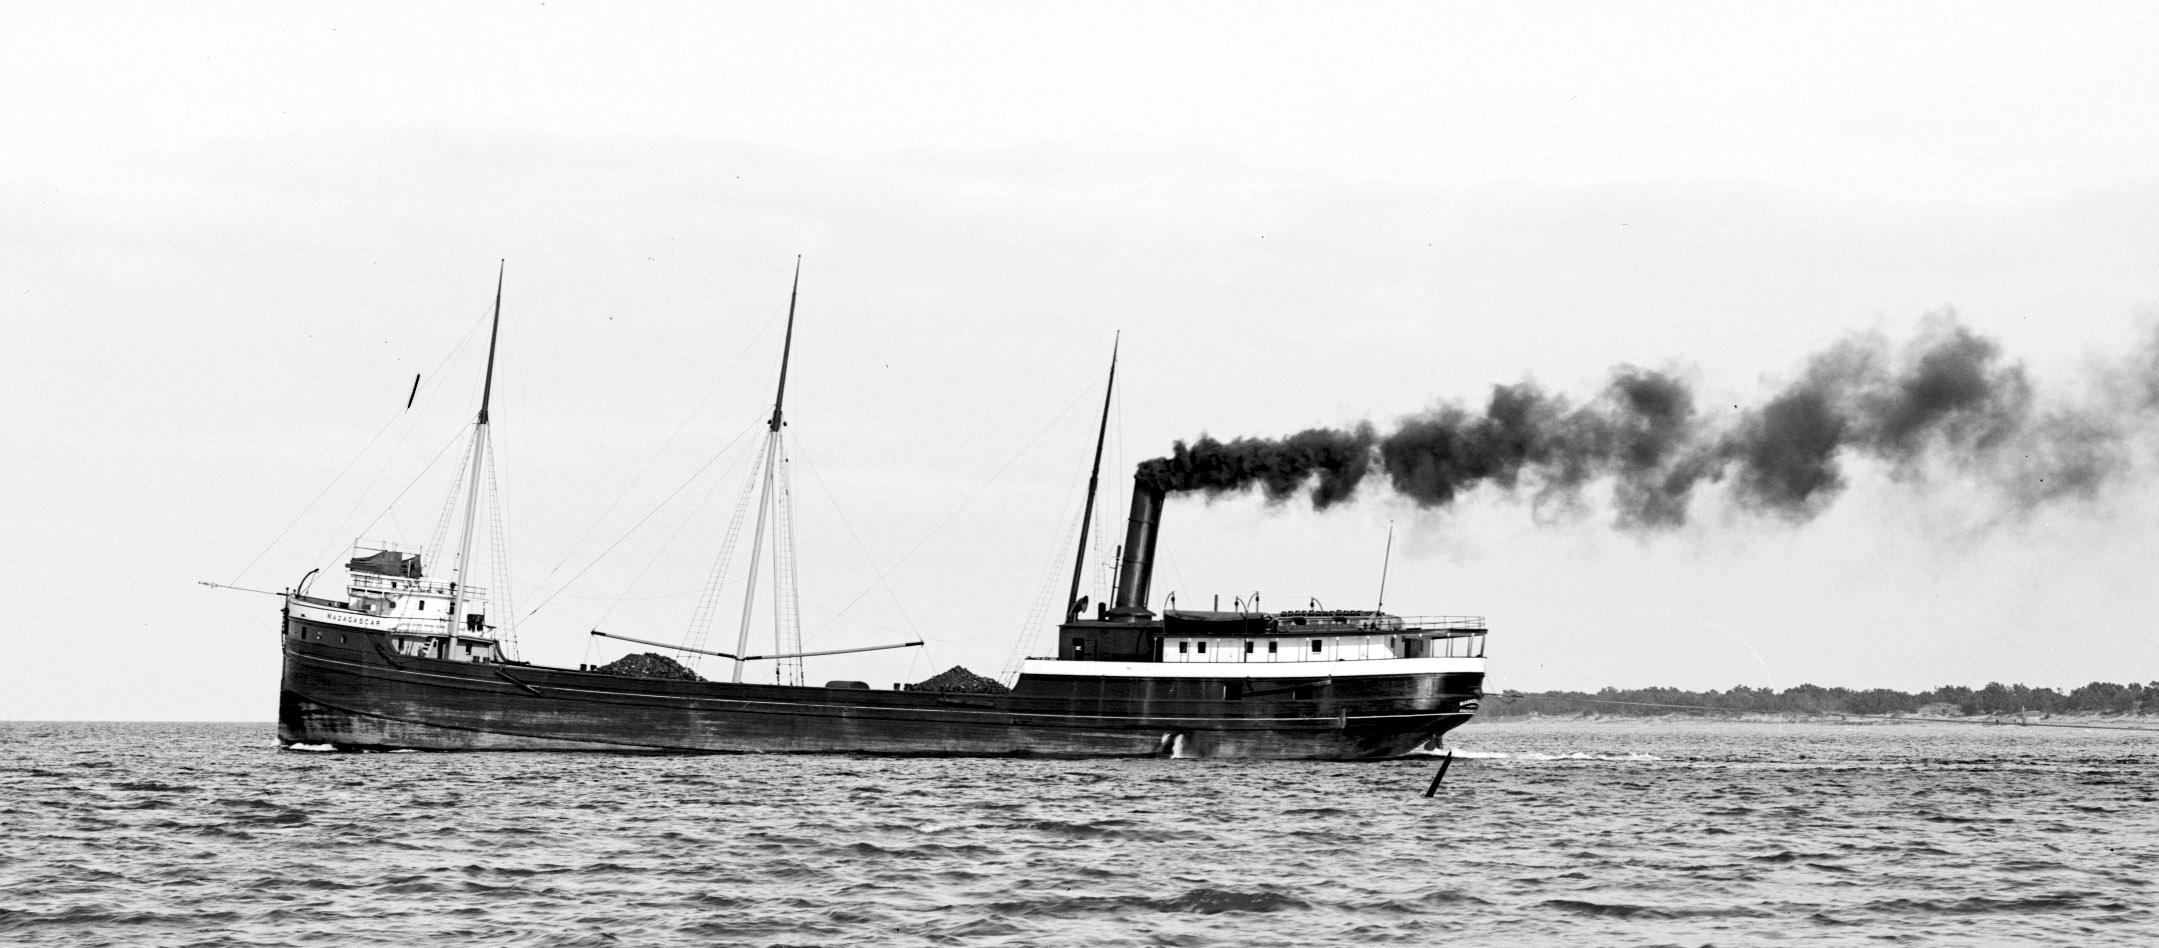 farkost till sjöss